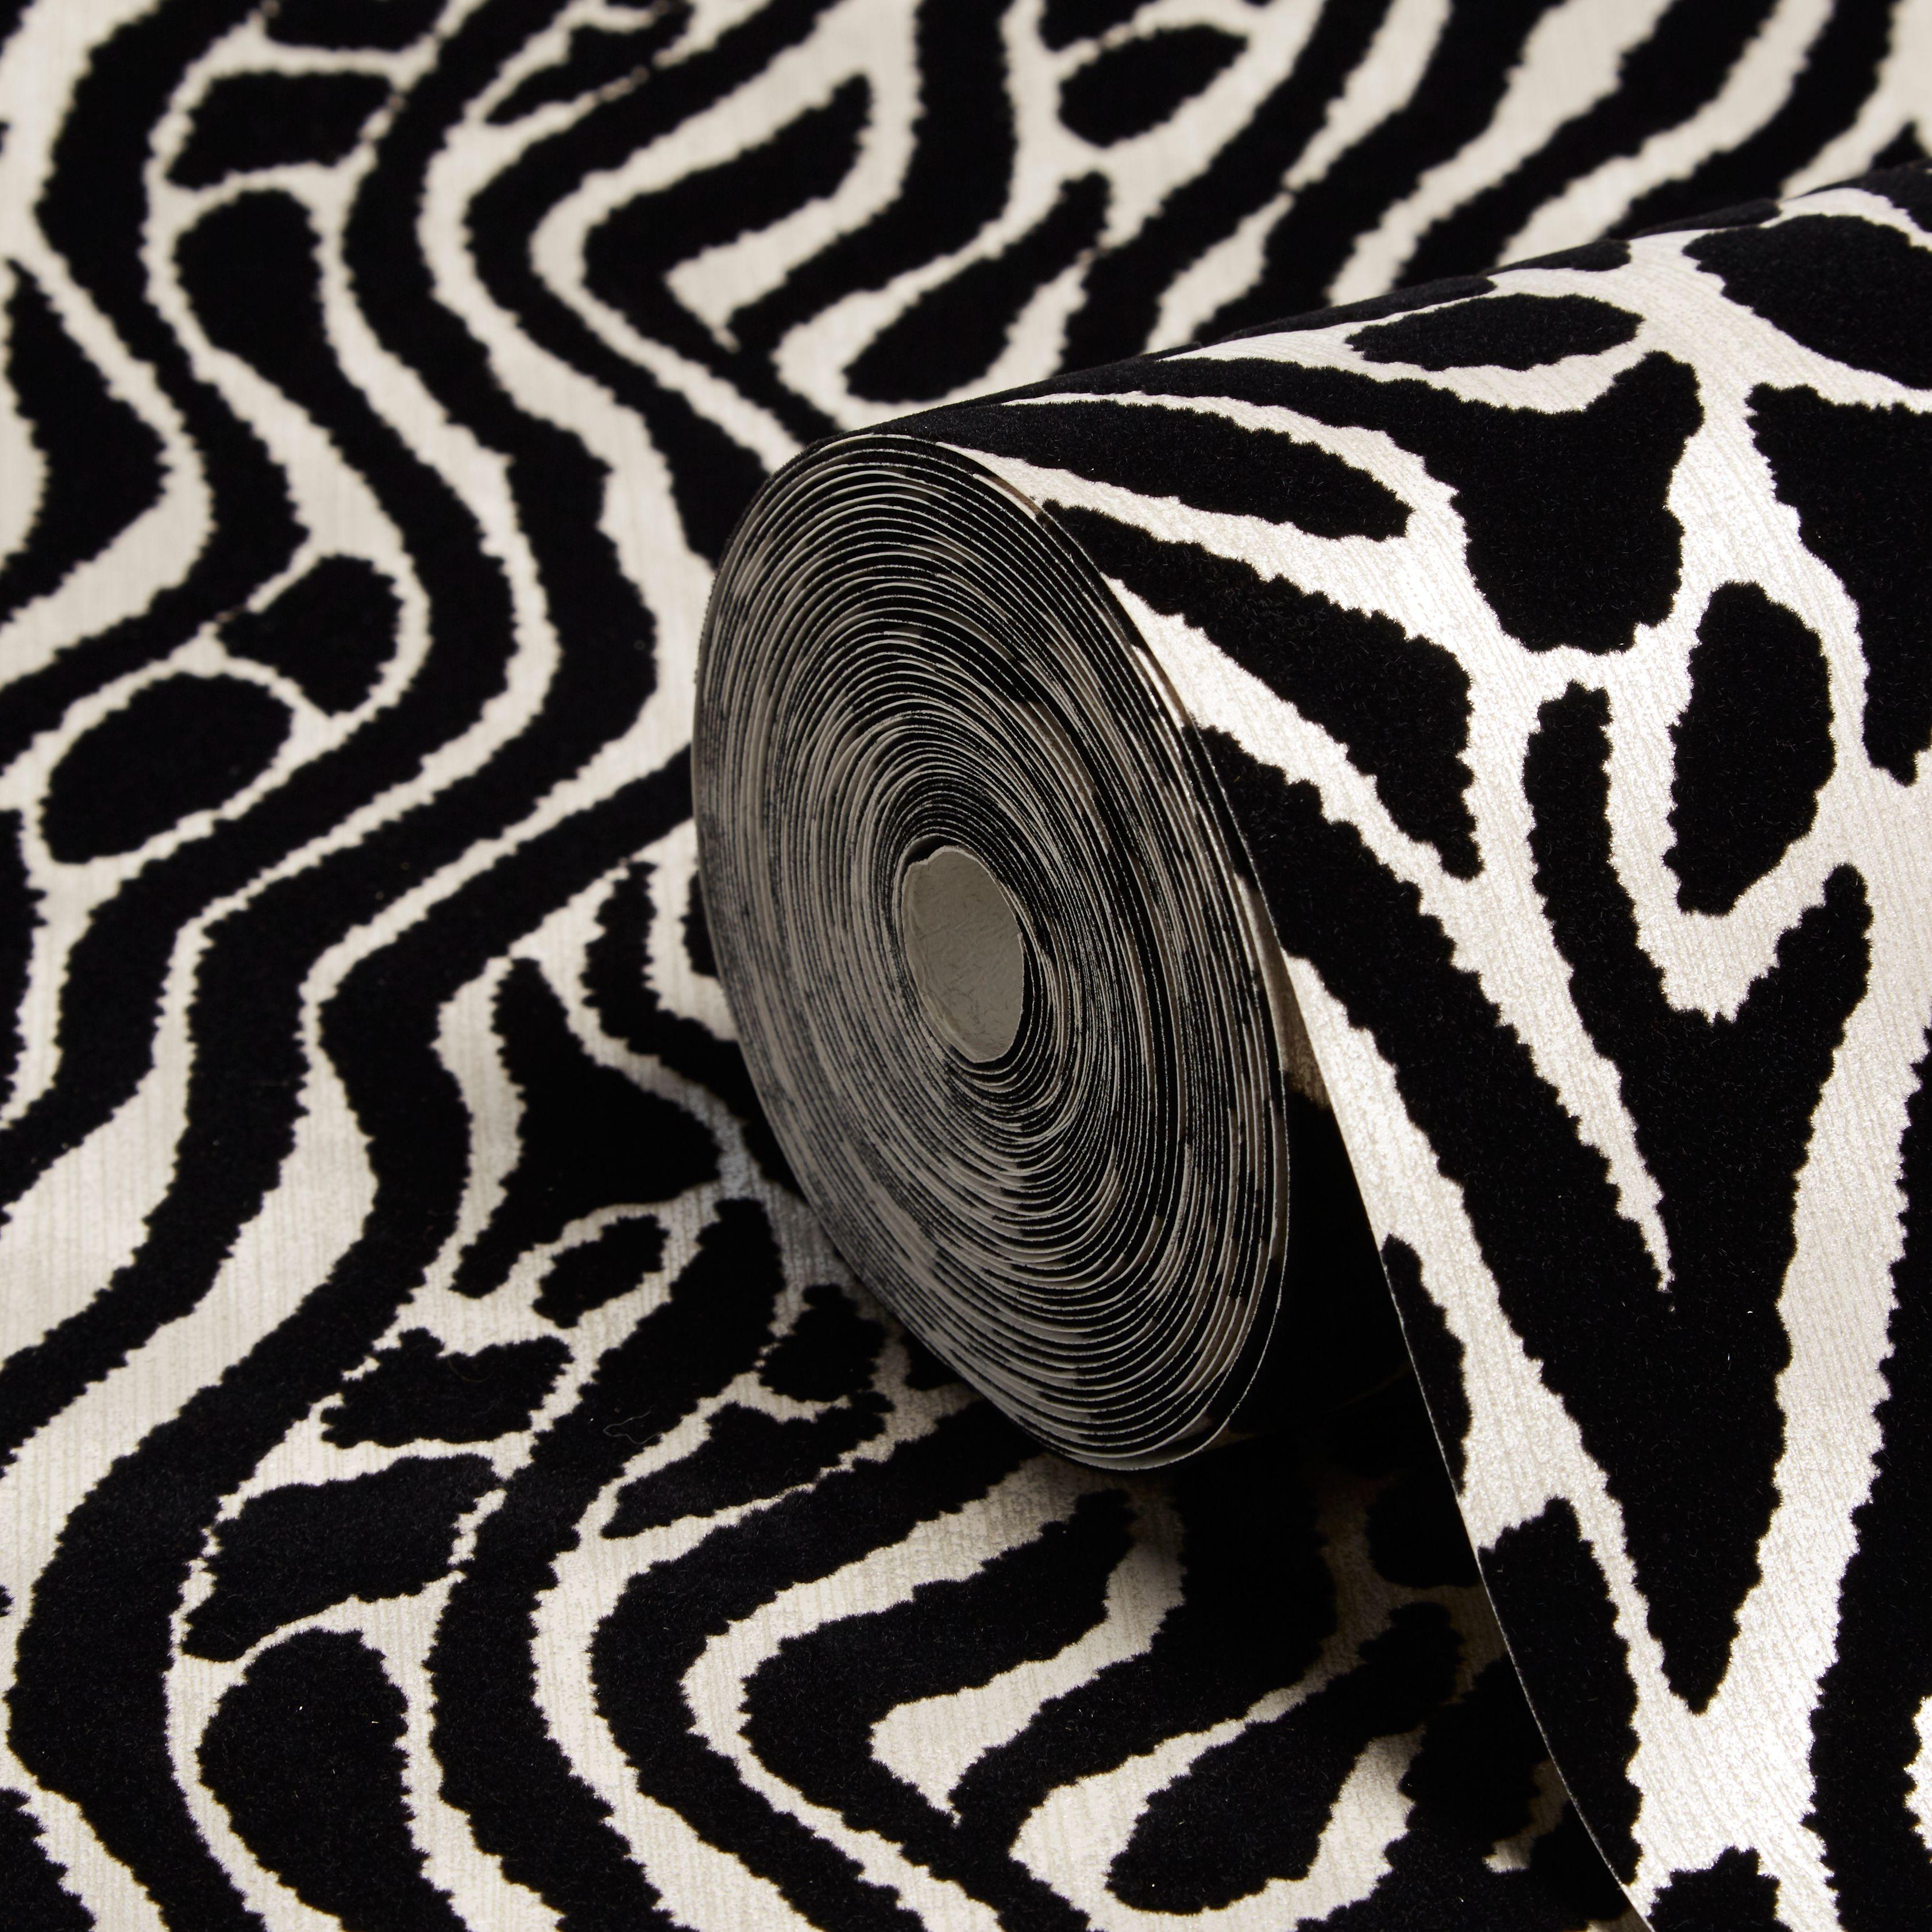 Zebra patterned wallpaper - Graham Brown Julien Macdonald Black Silver Animal Print Wallpaper